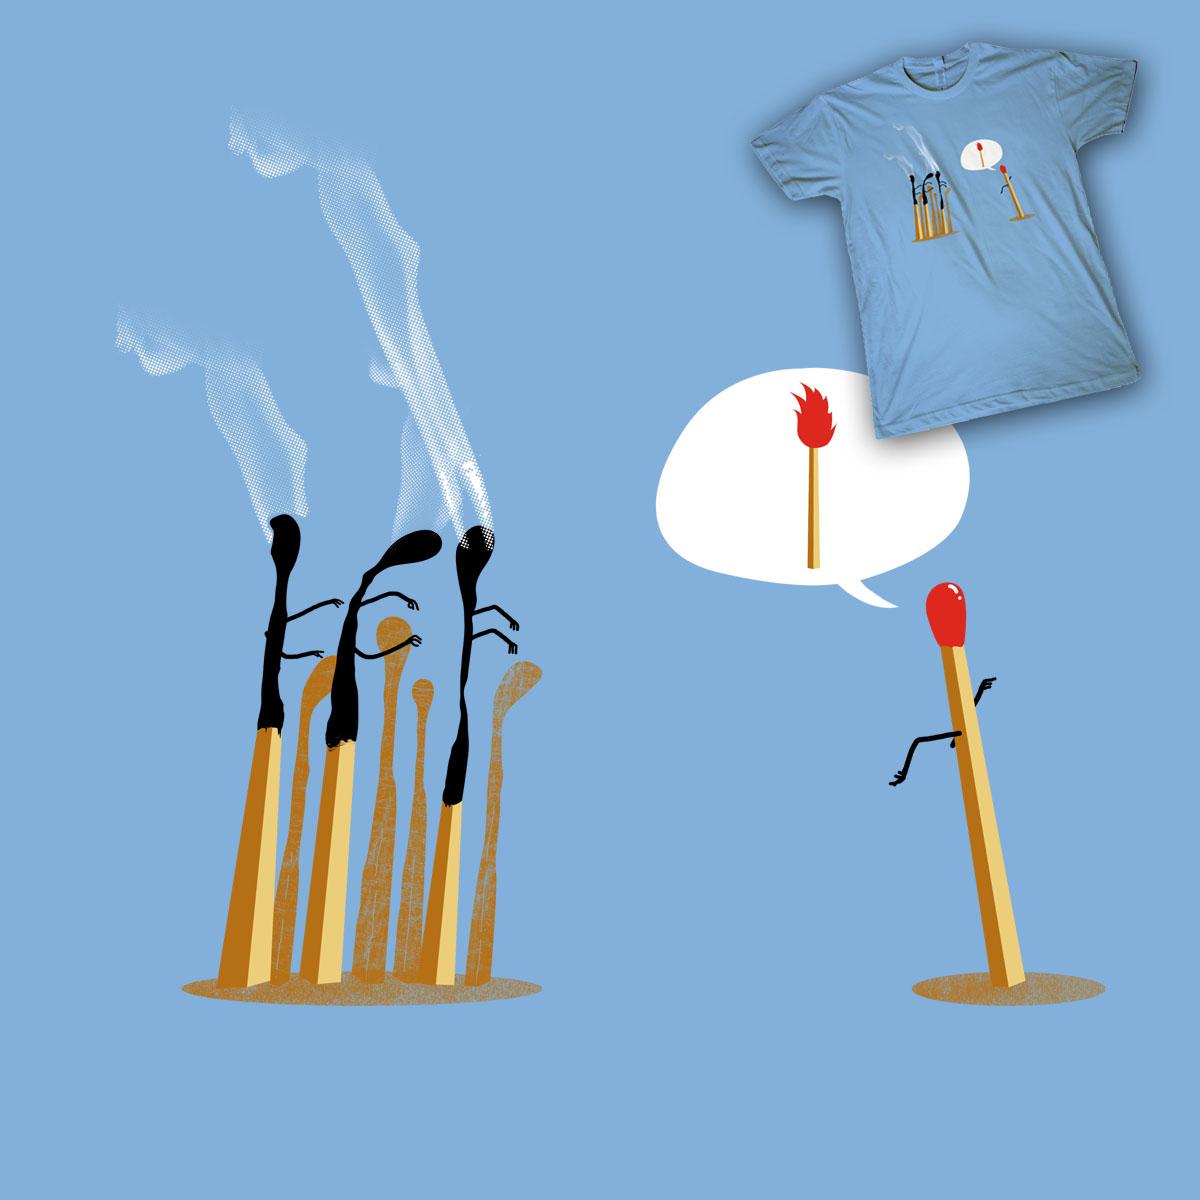 Death Match by mainial on Threadless